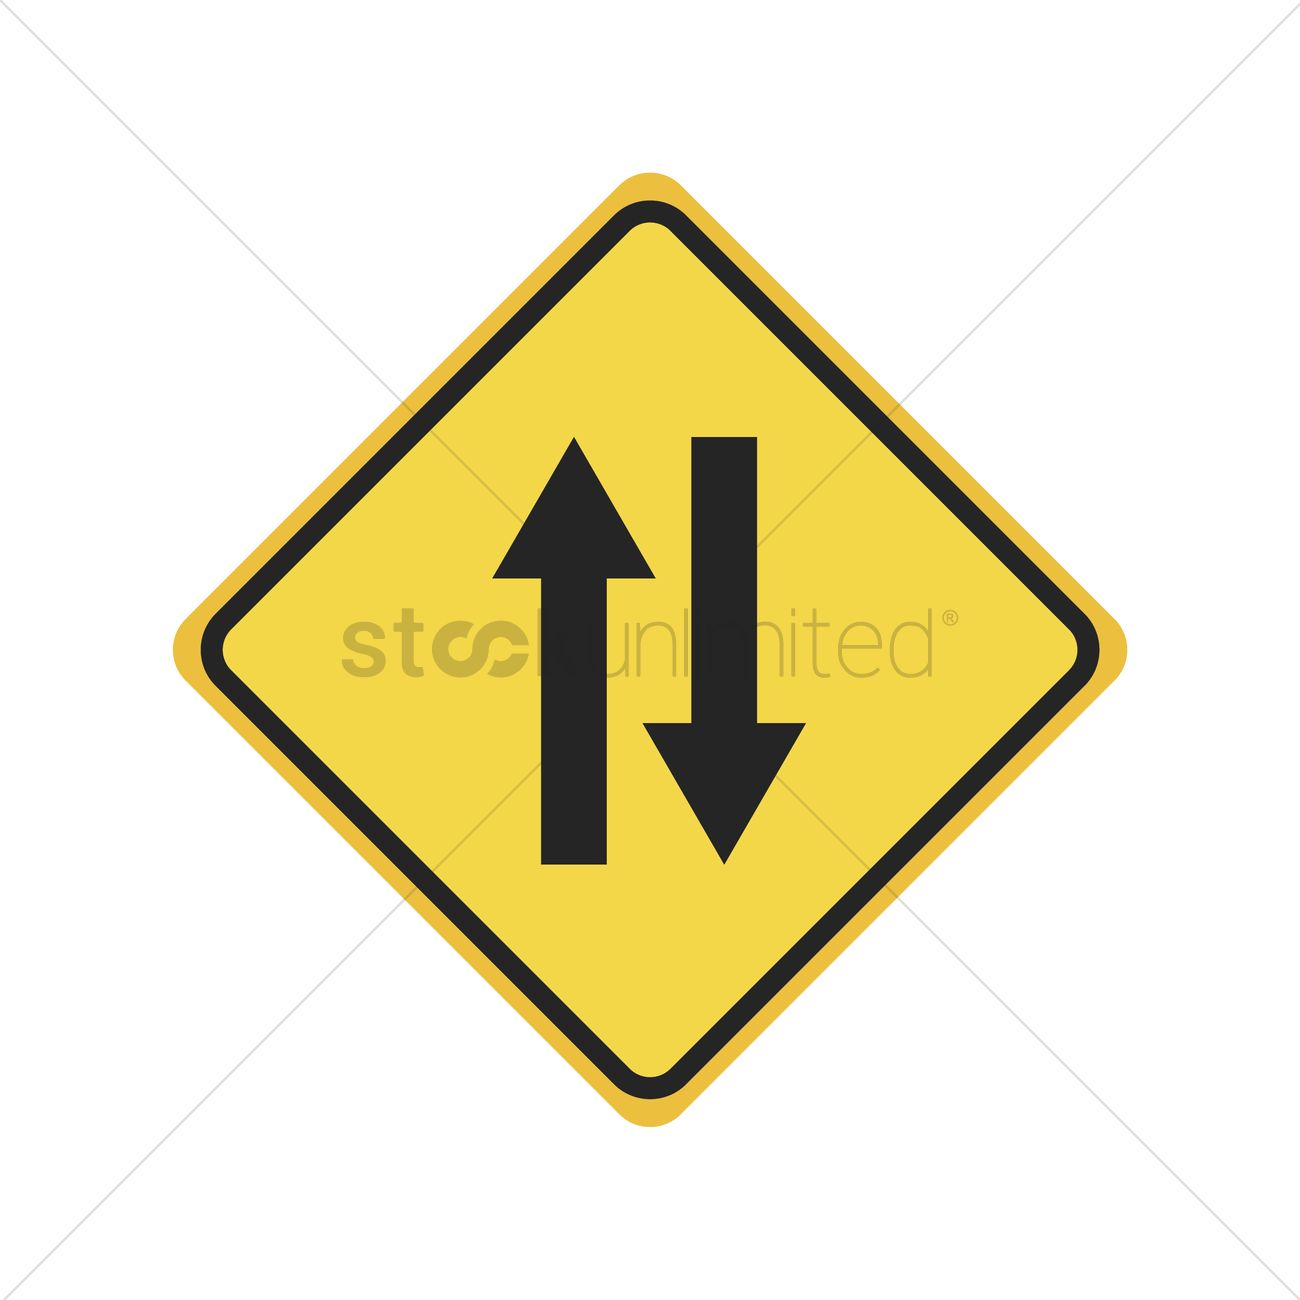 Two way traffic ahead - Fleet Dynamic |Two Way Traffic Ahead Sign